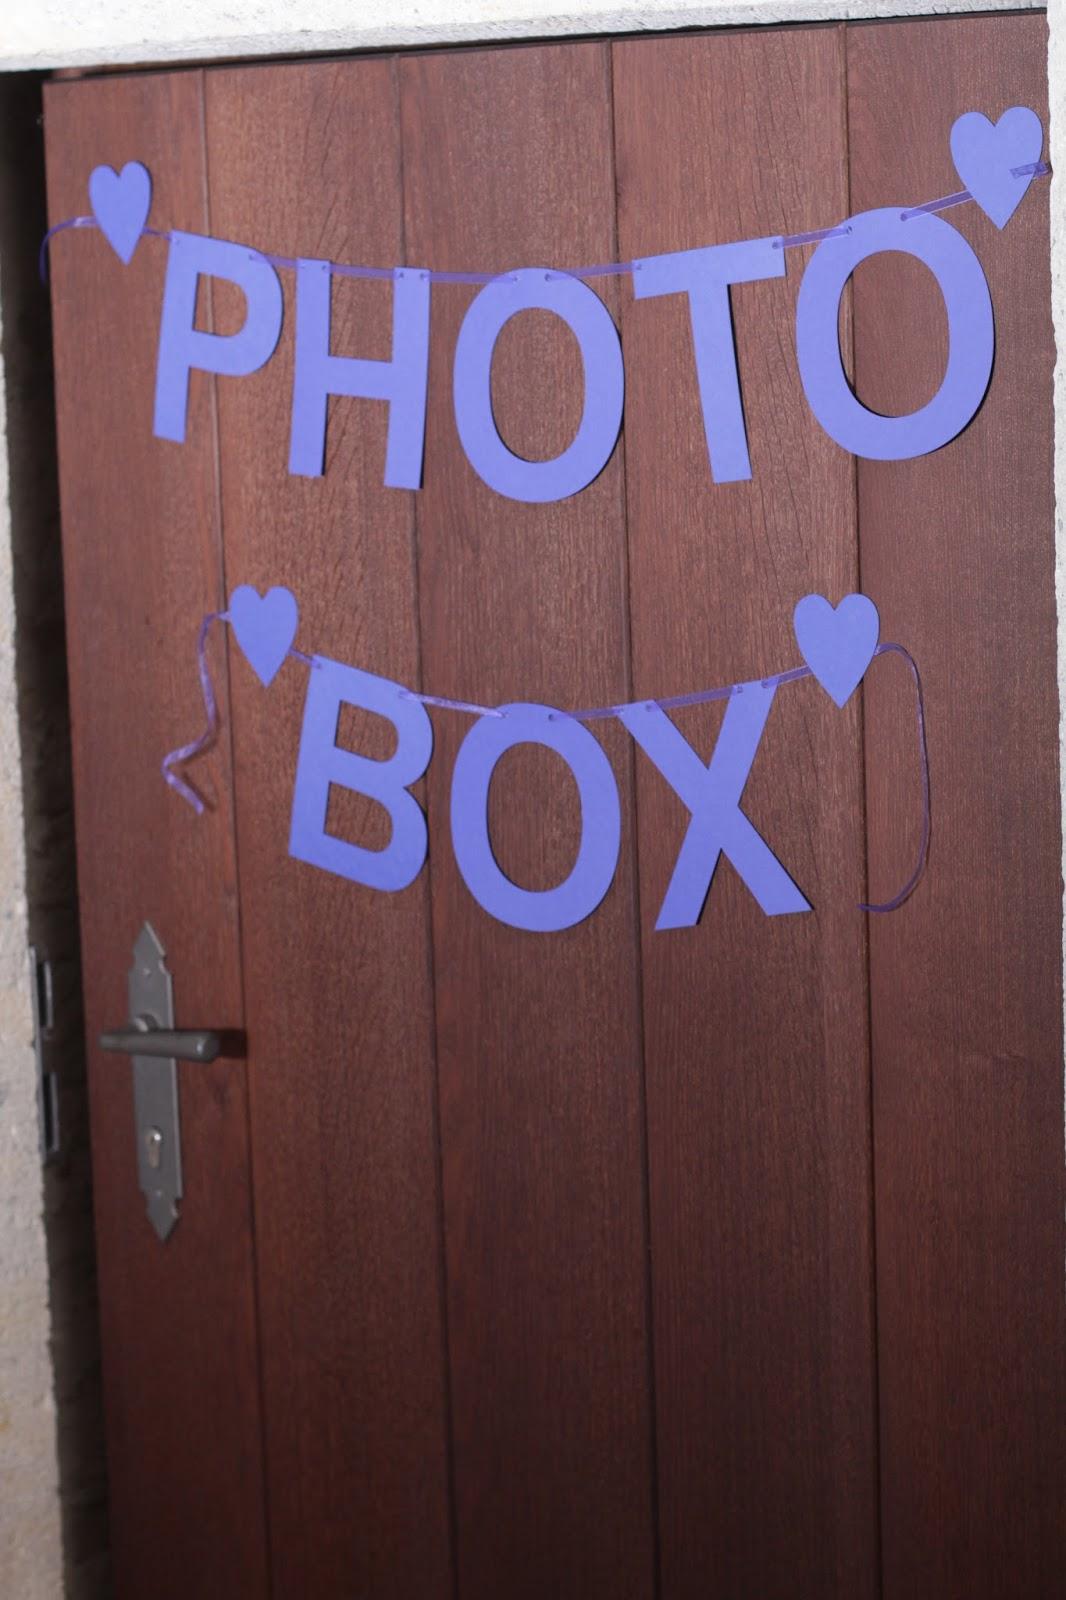 PhotoBooth photobox metterlink